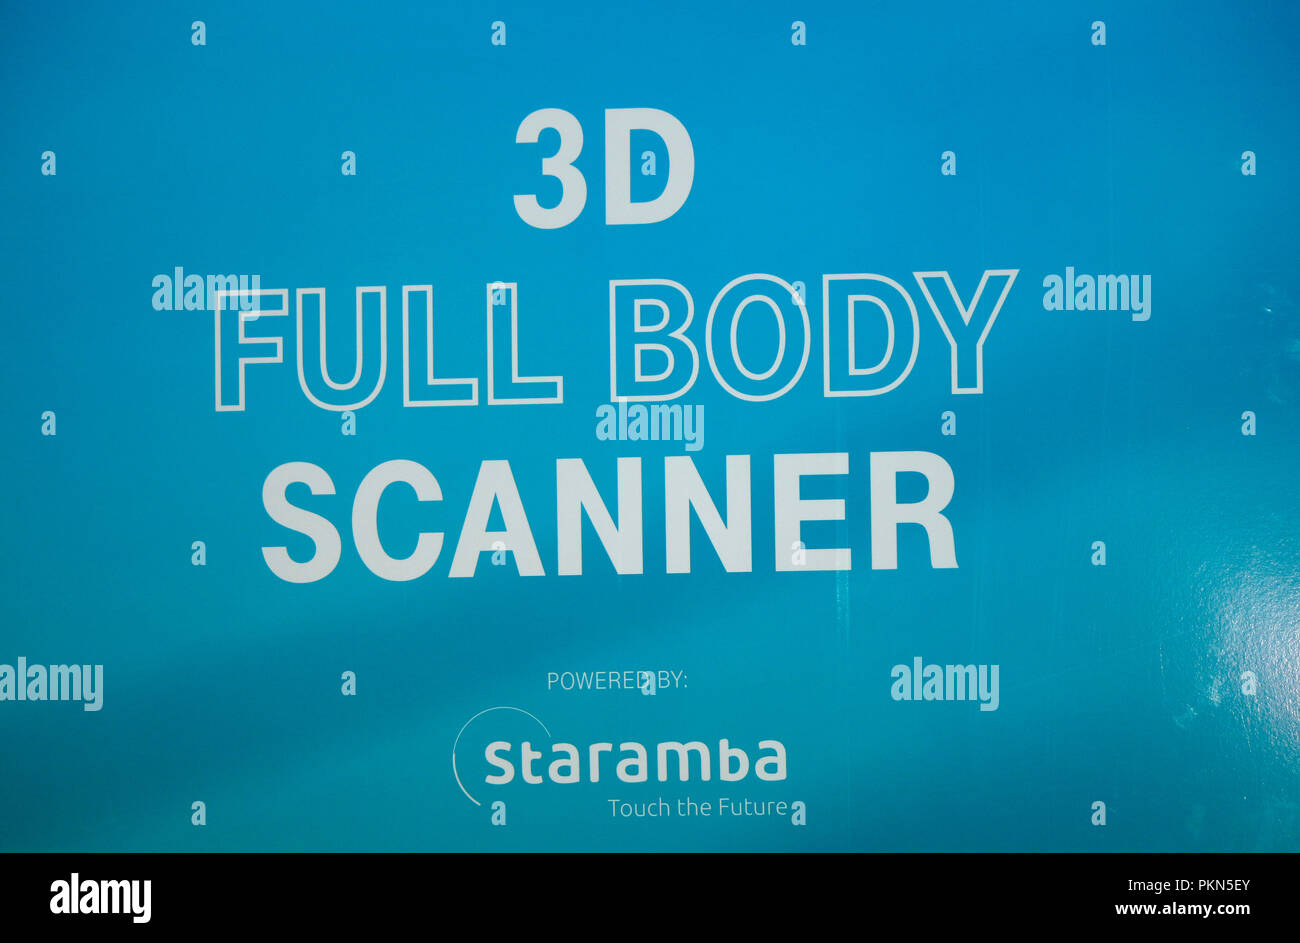 Ein '3d' der Escáner de cuerpo completo 'Firma' taramba, Berlín. Imagen De Stock